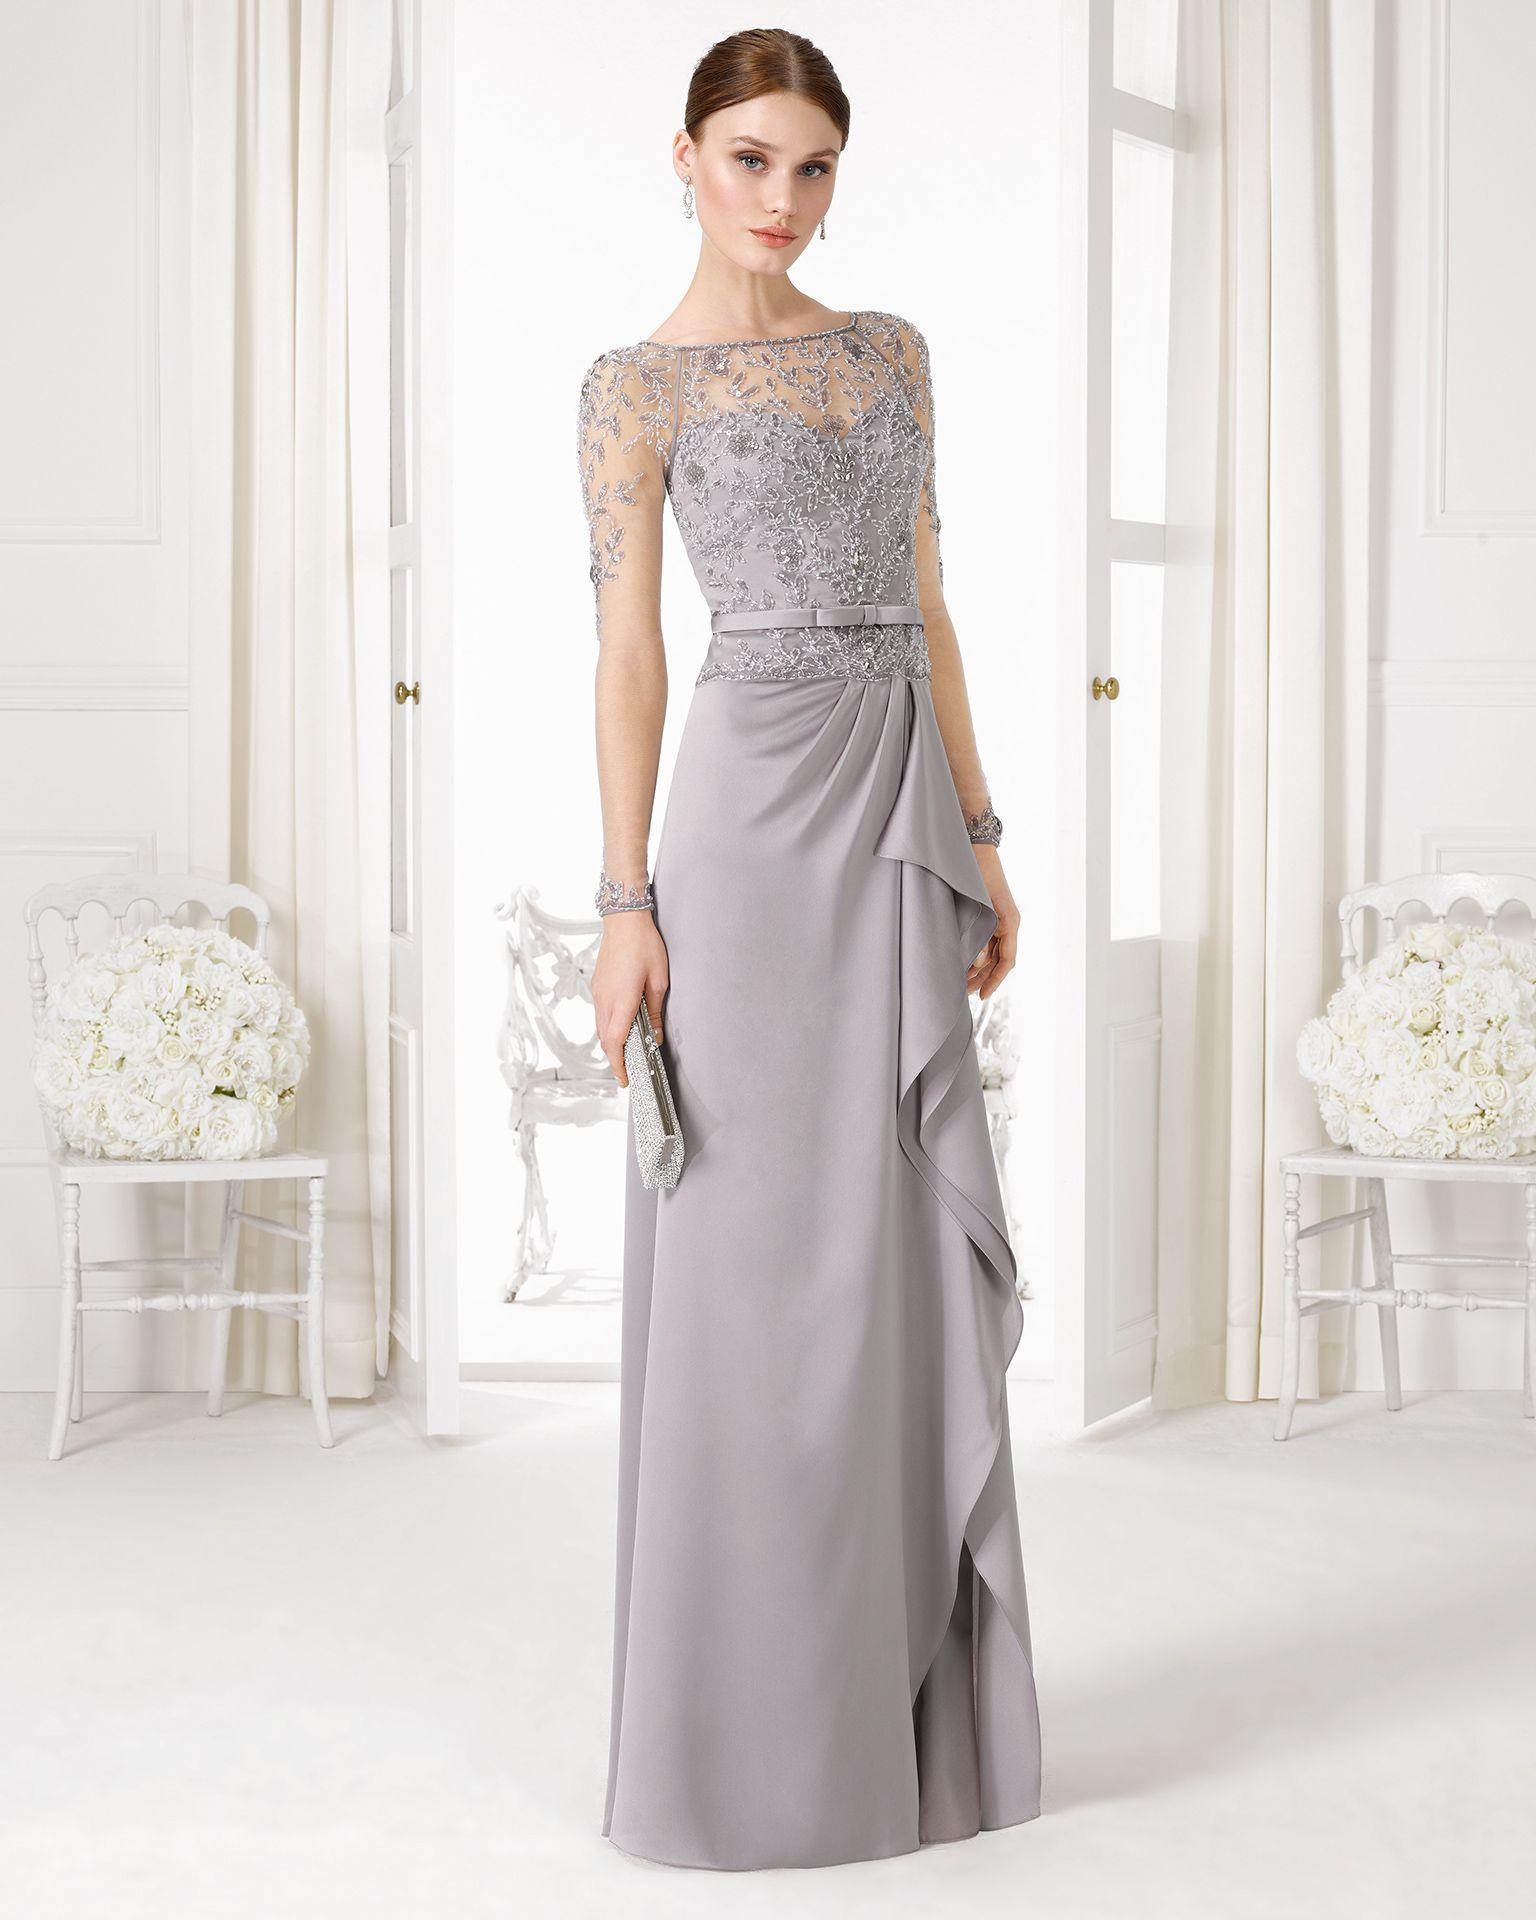 Vestidos matrimonio noche 2016